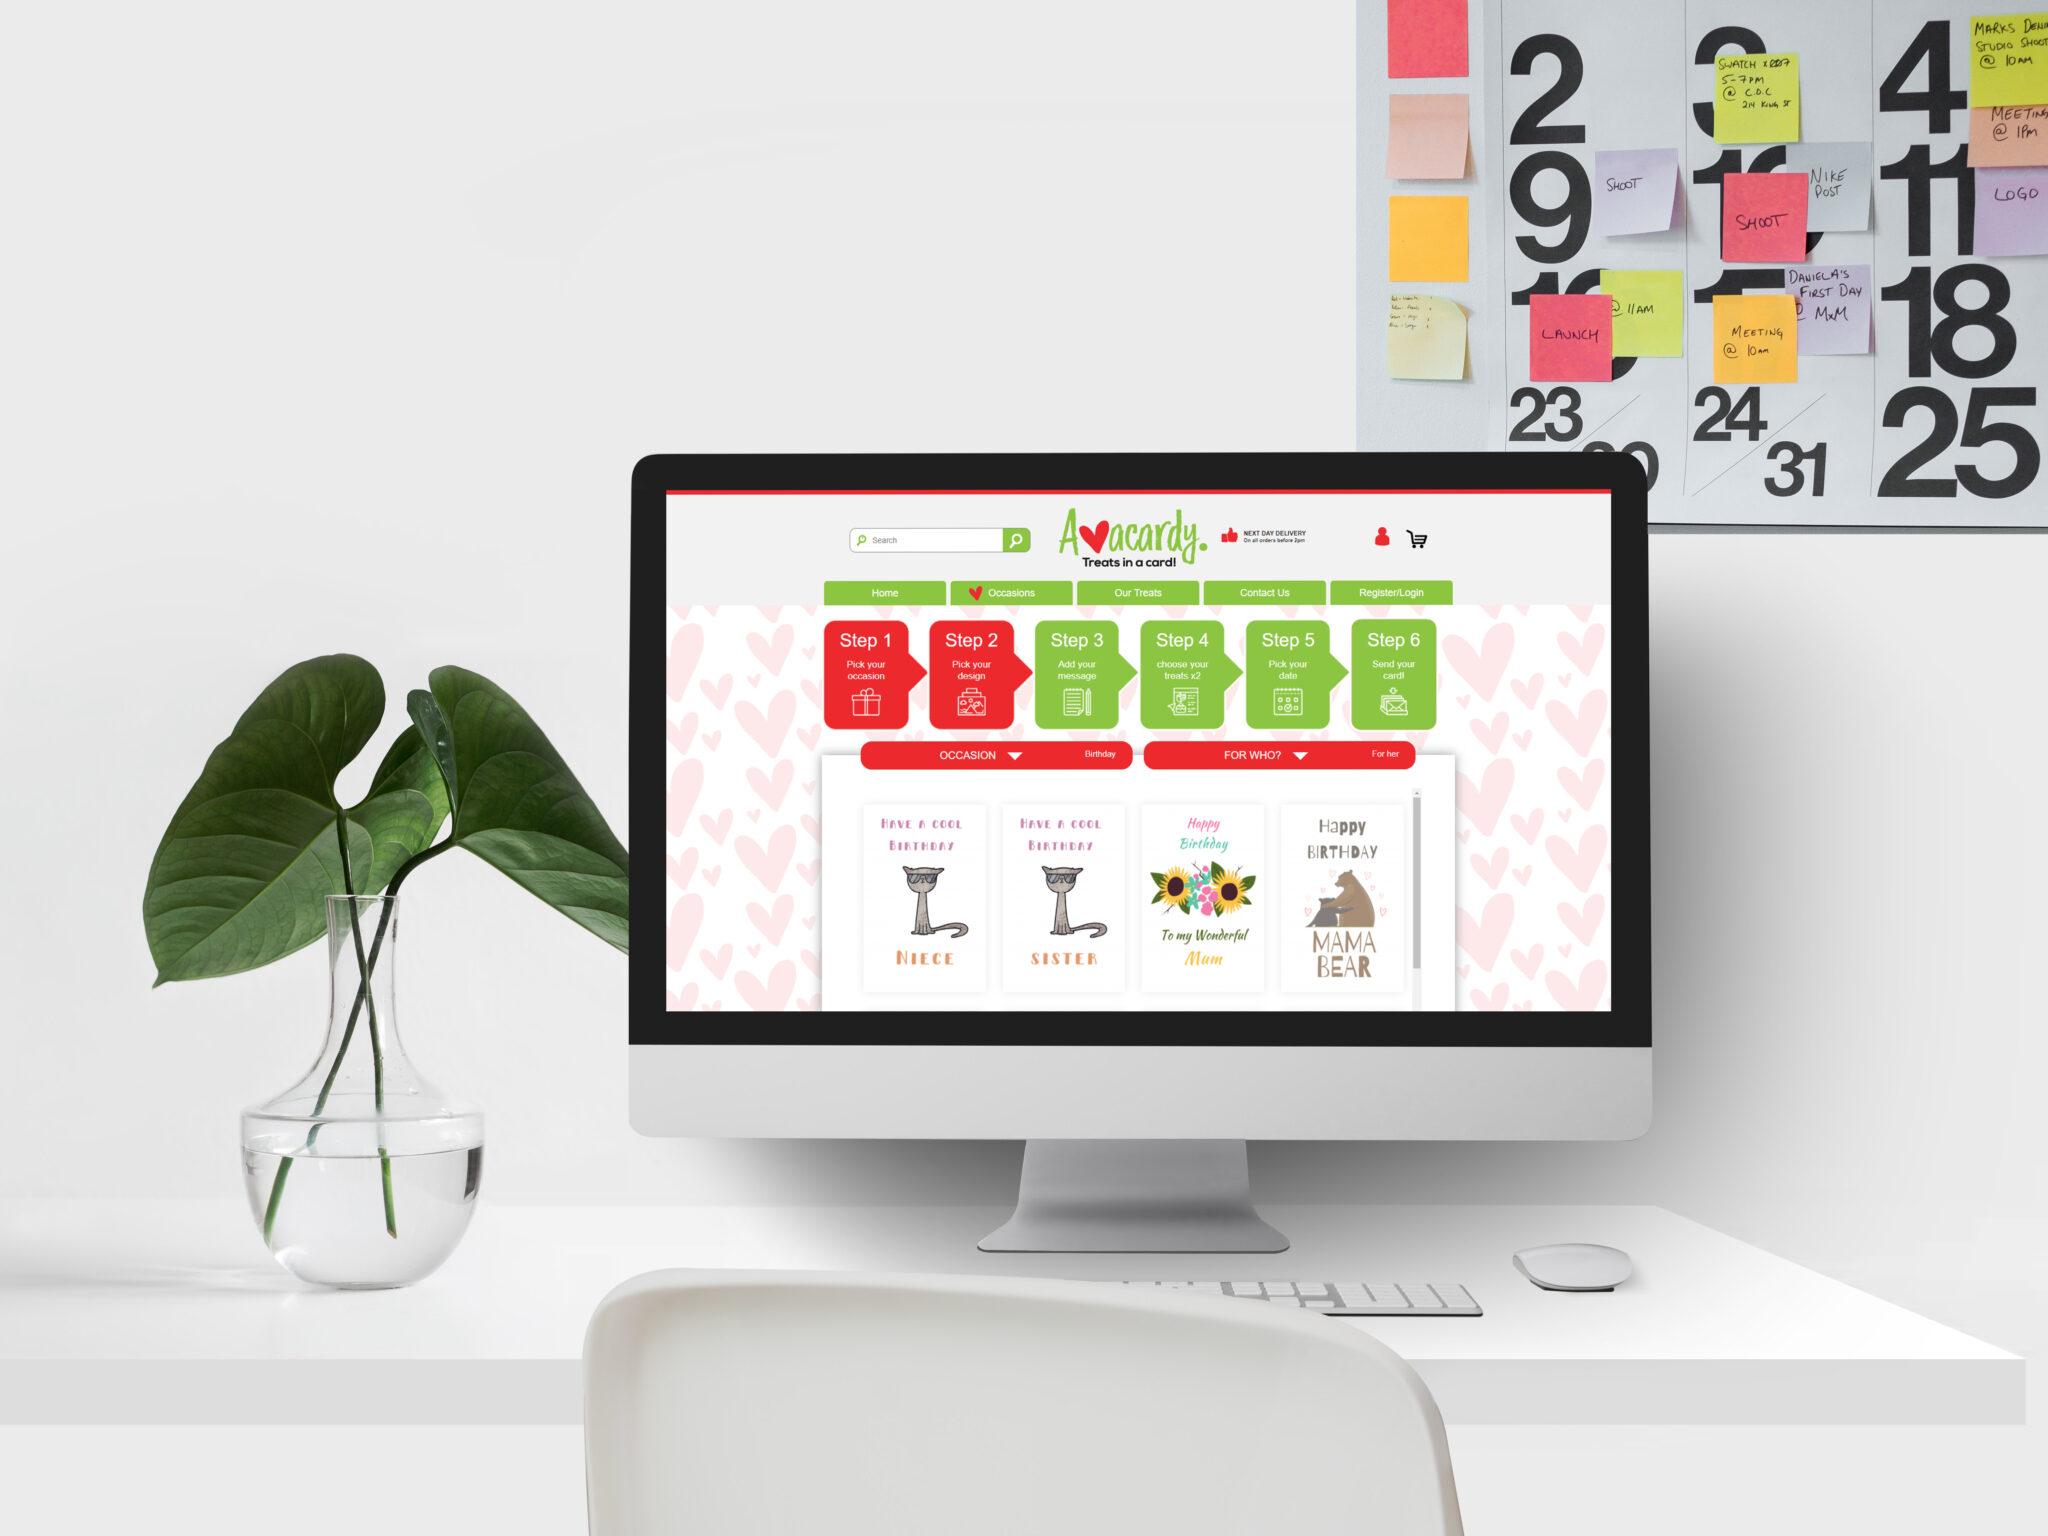 Desktop-Mockup avacardy 2